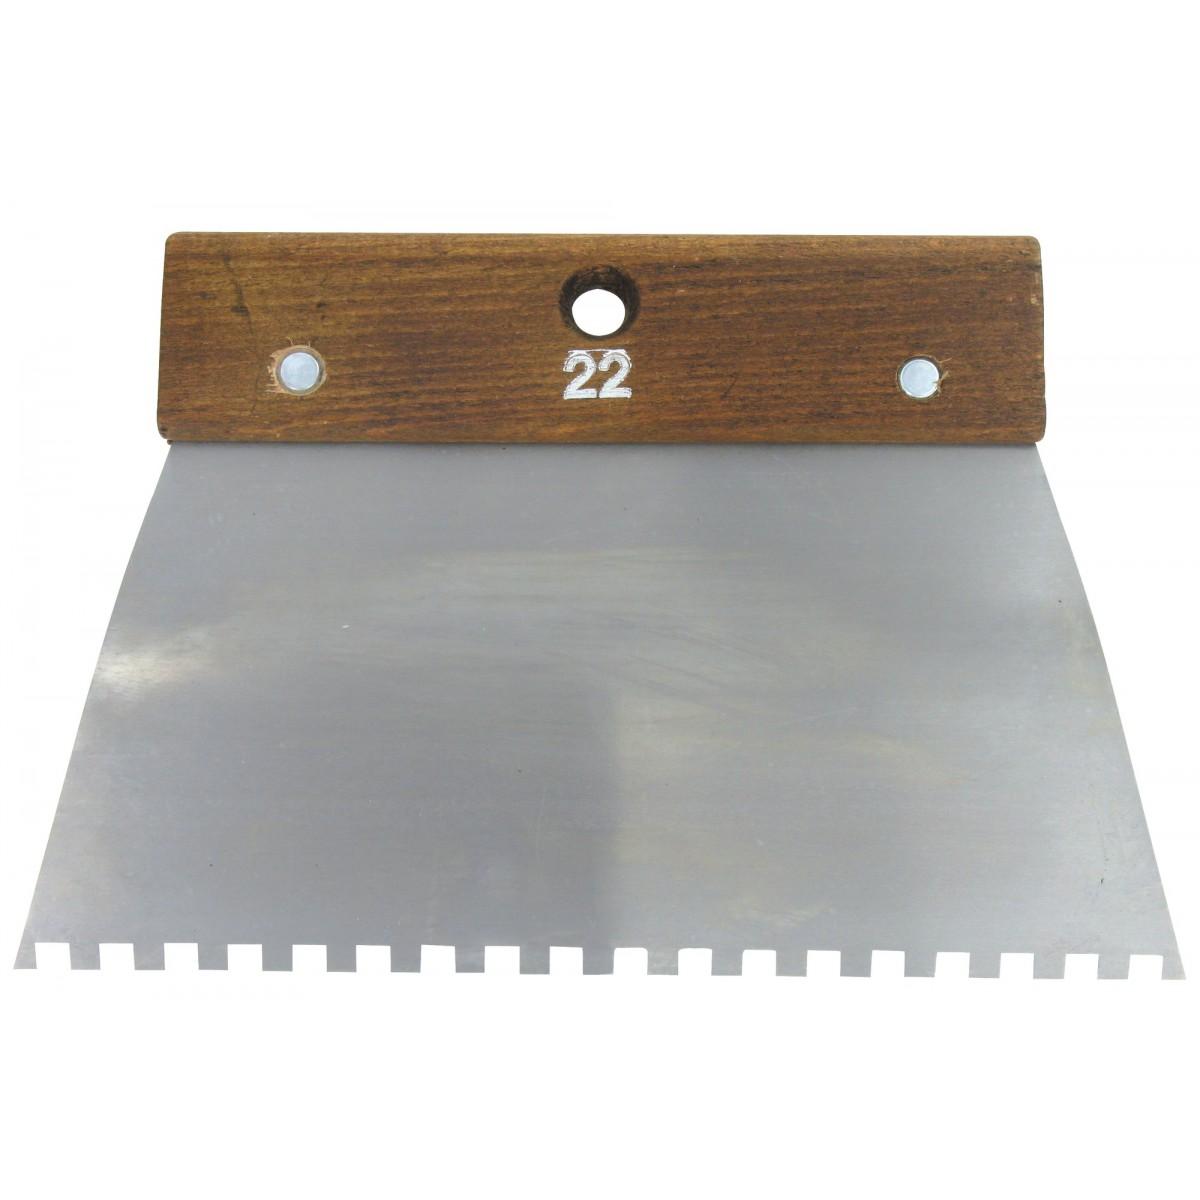 Peigne acier cambre Outibat - Denture carrée 6 x 6 mm - Dimensions 220 mm